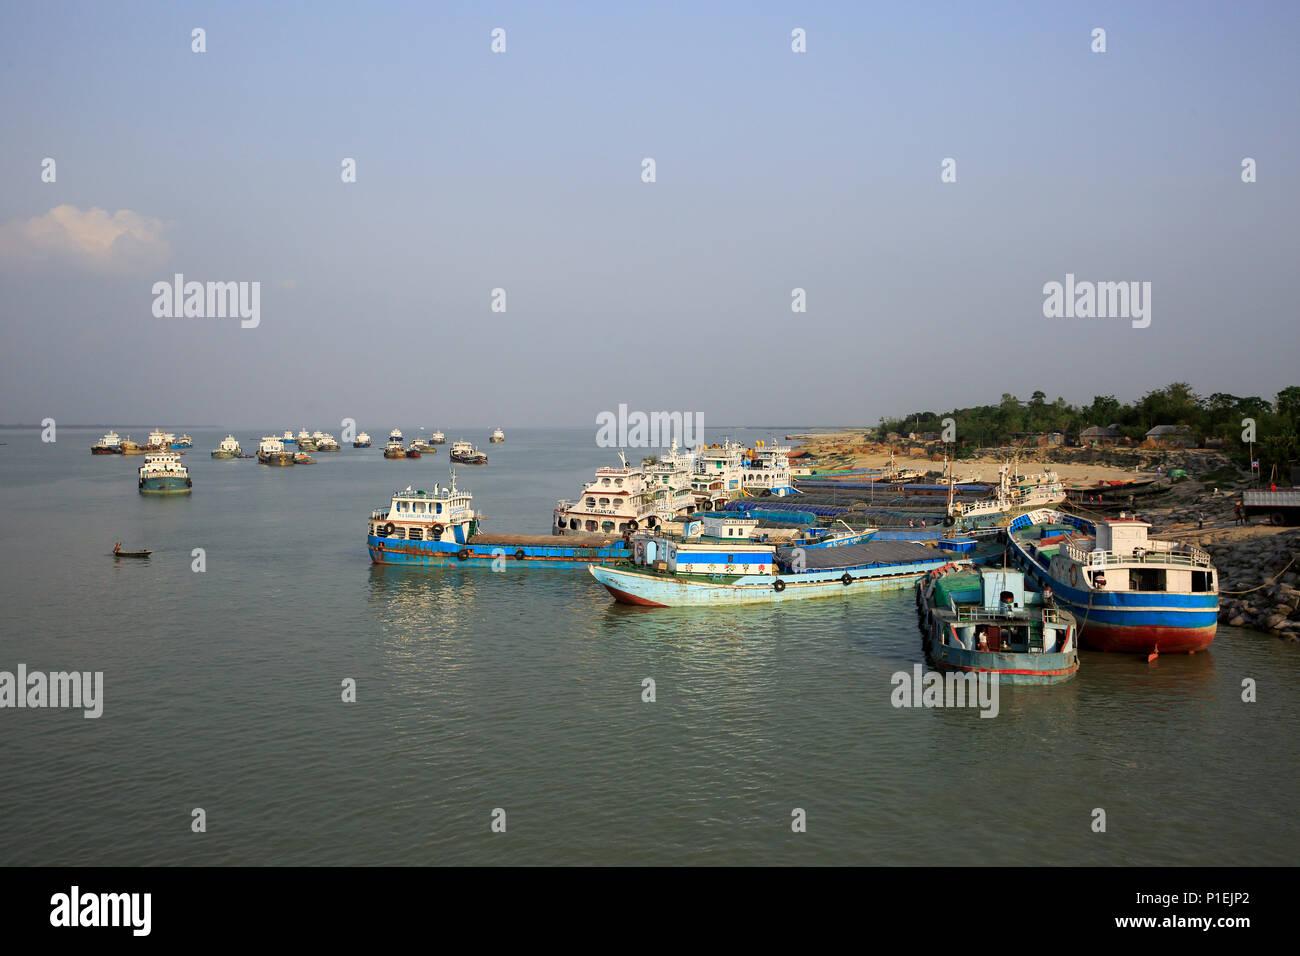 Cargo vessel anchored at the Daulatdia ghat, Rajbari, Bangladesh - Stock Image